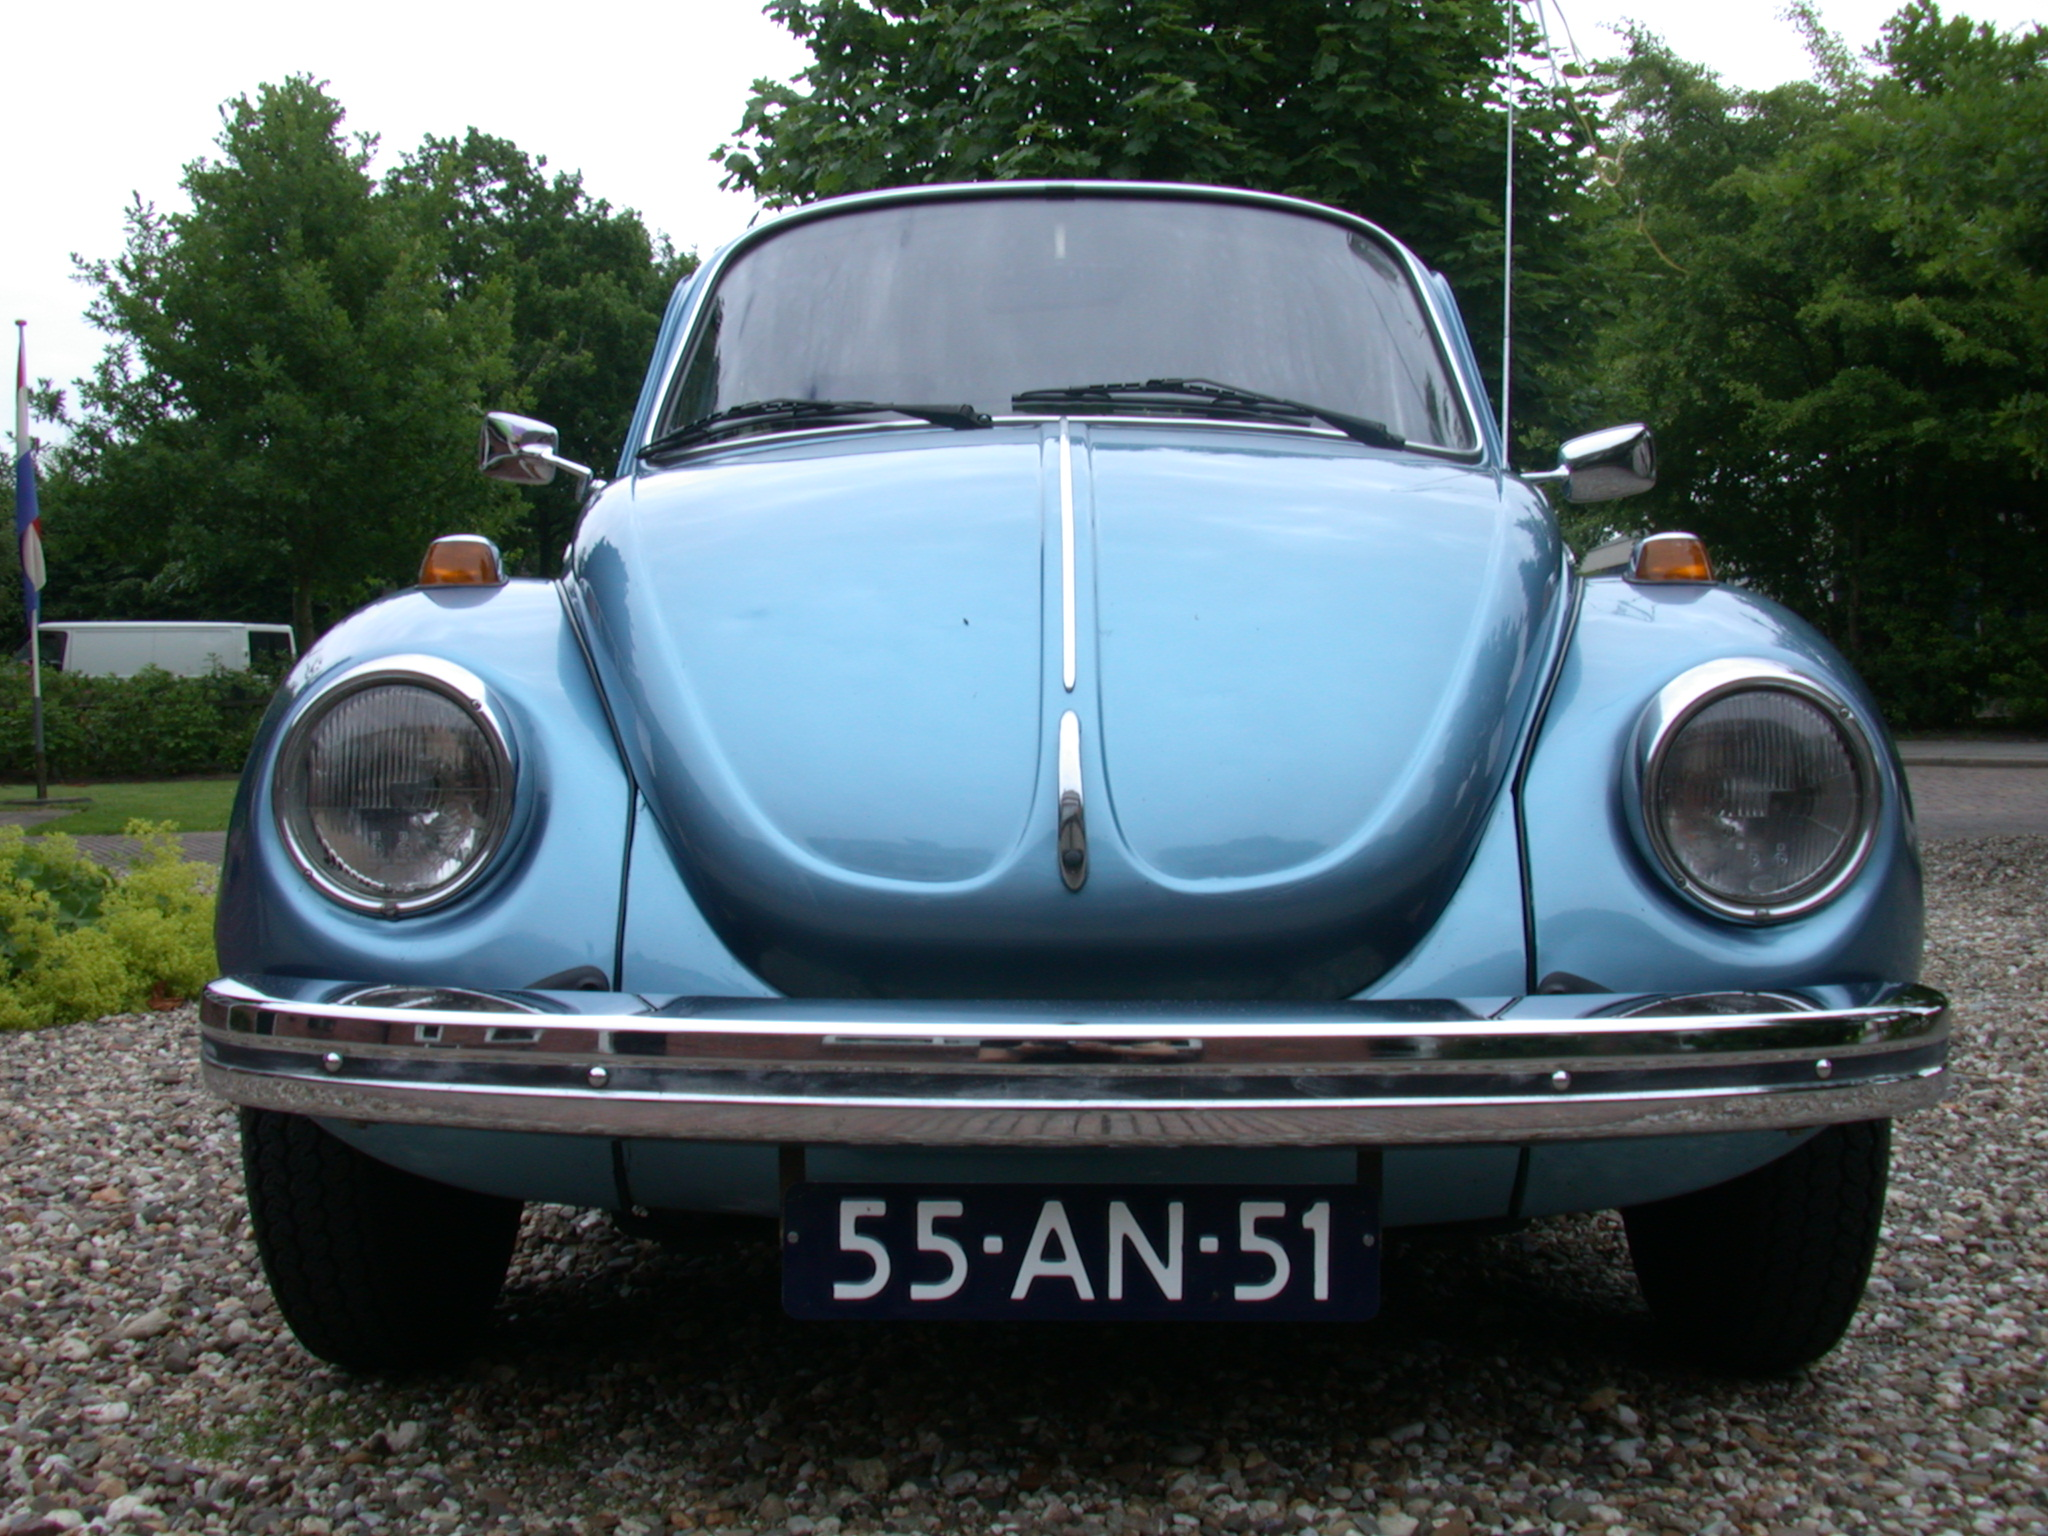 vehicles land vw volkswagen beatle front headlight bumper chrome headlights lights licenceplate numbers typography sanserif